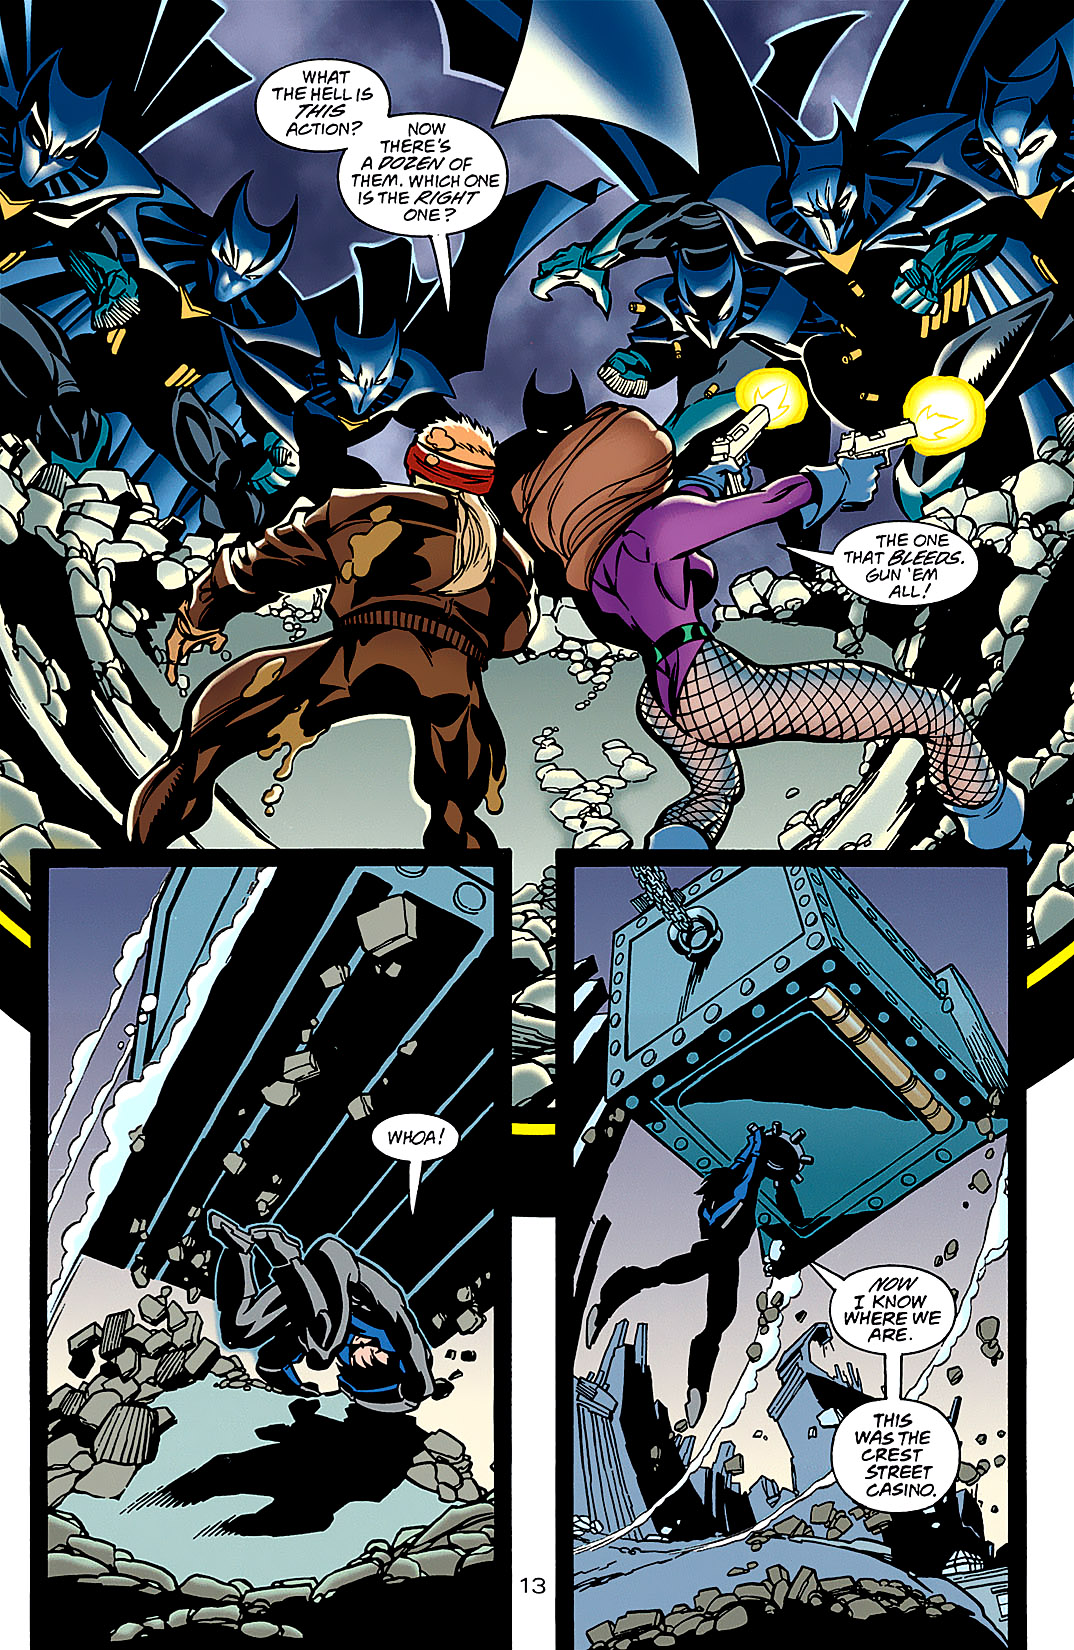 Nightwing (1996) chap 1000000 pic 14